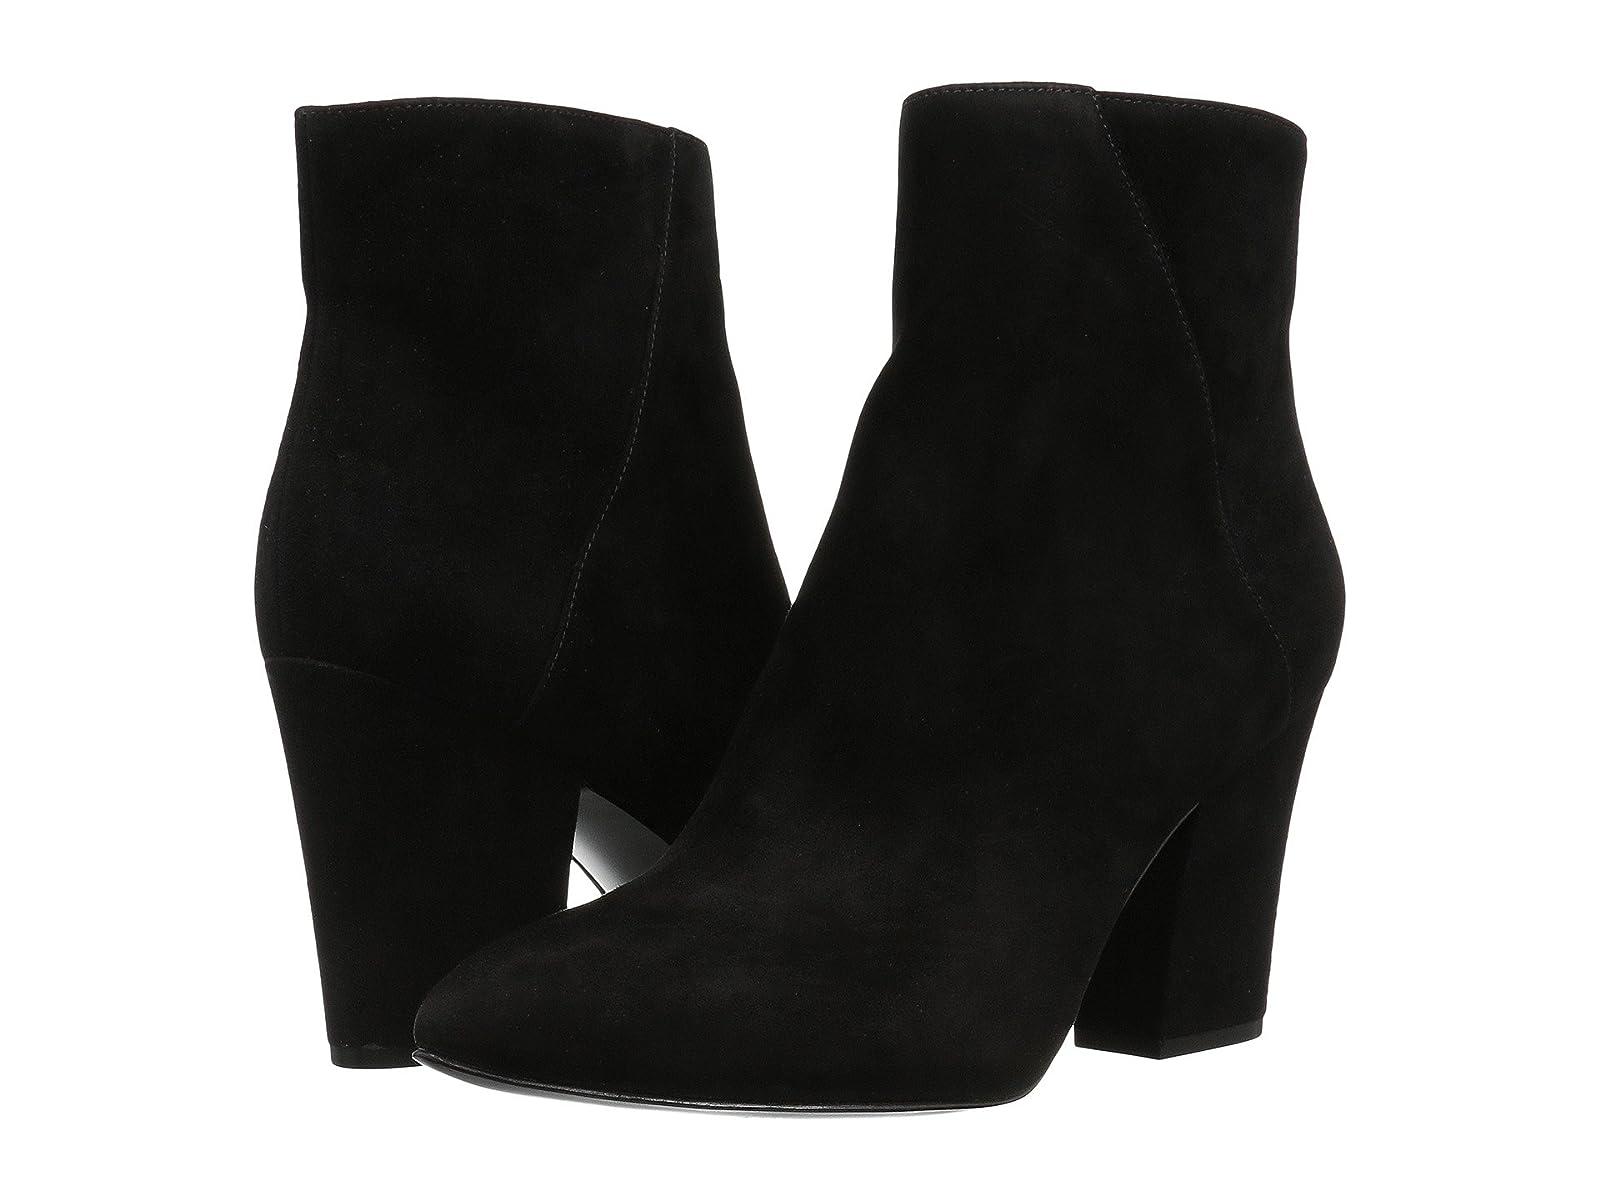 Nine West SavitraCheap and distinctive eye-catching shoes